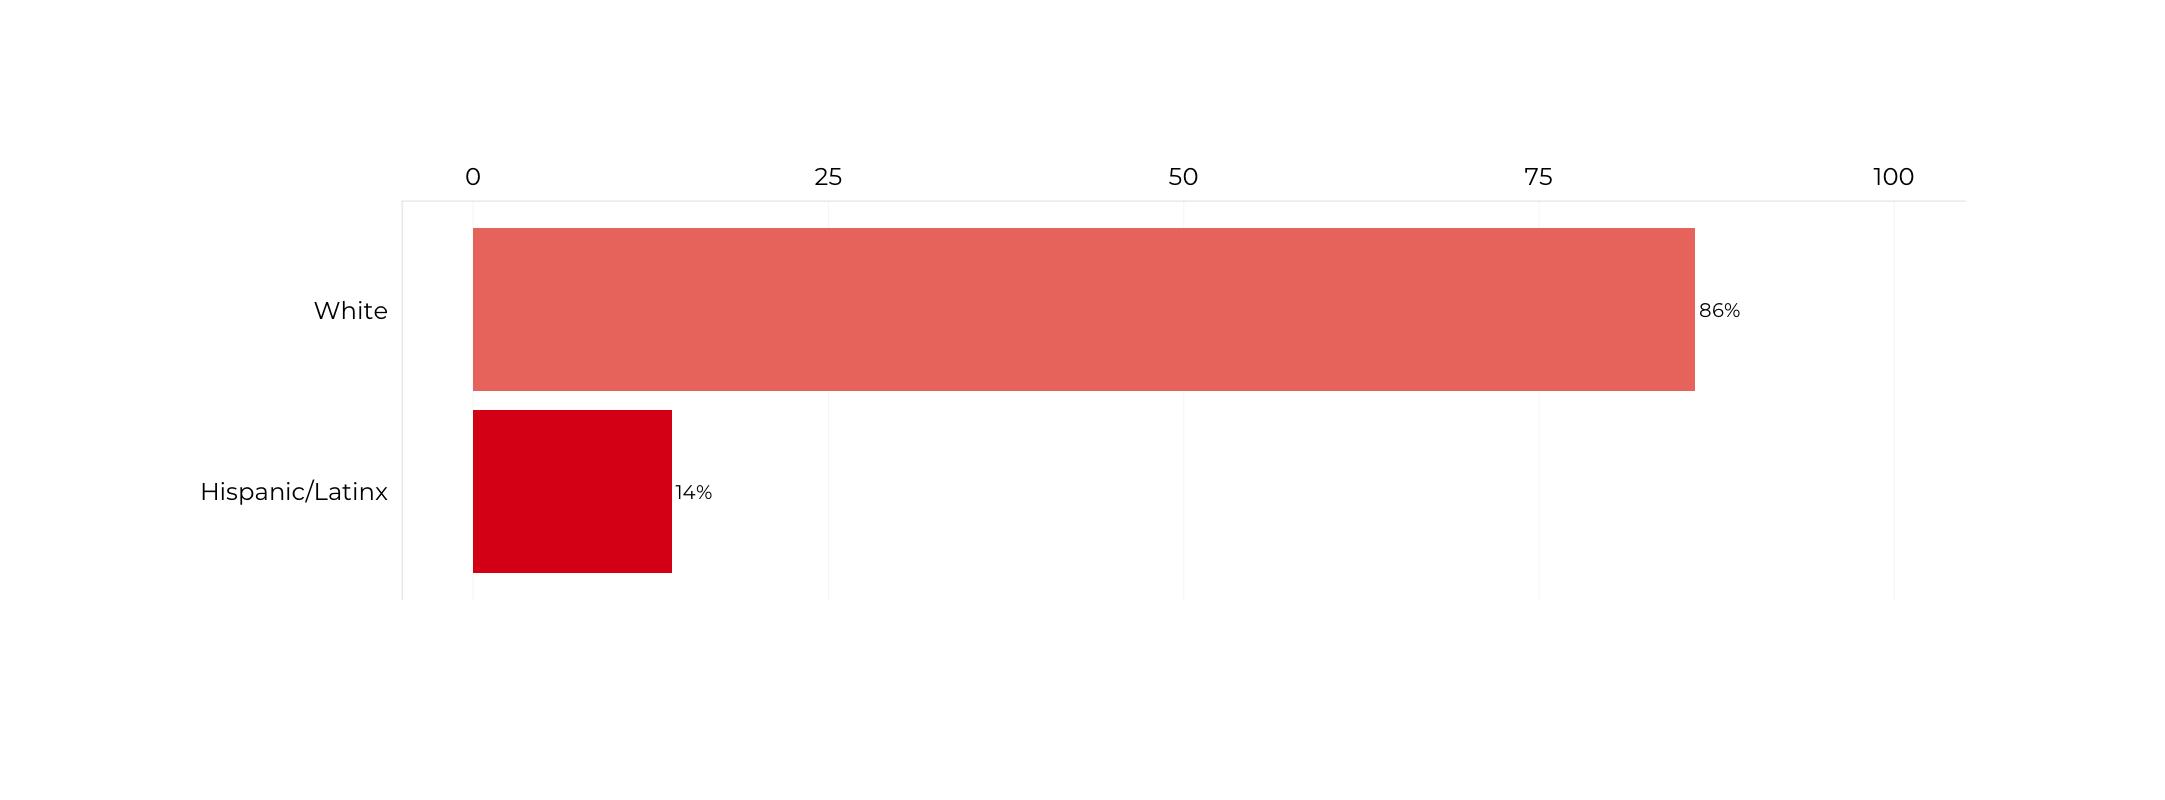 Graph about Racial Composition of Deputy Secretaries of Homeland Security. More detailed text description below.